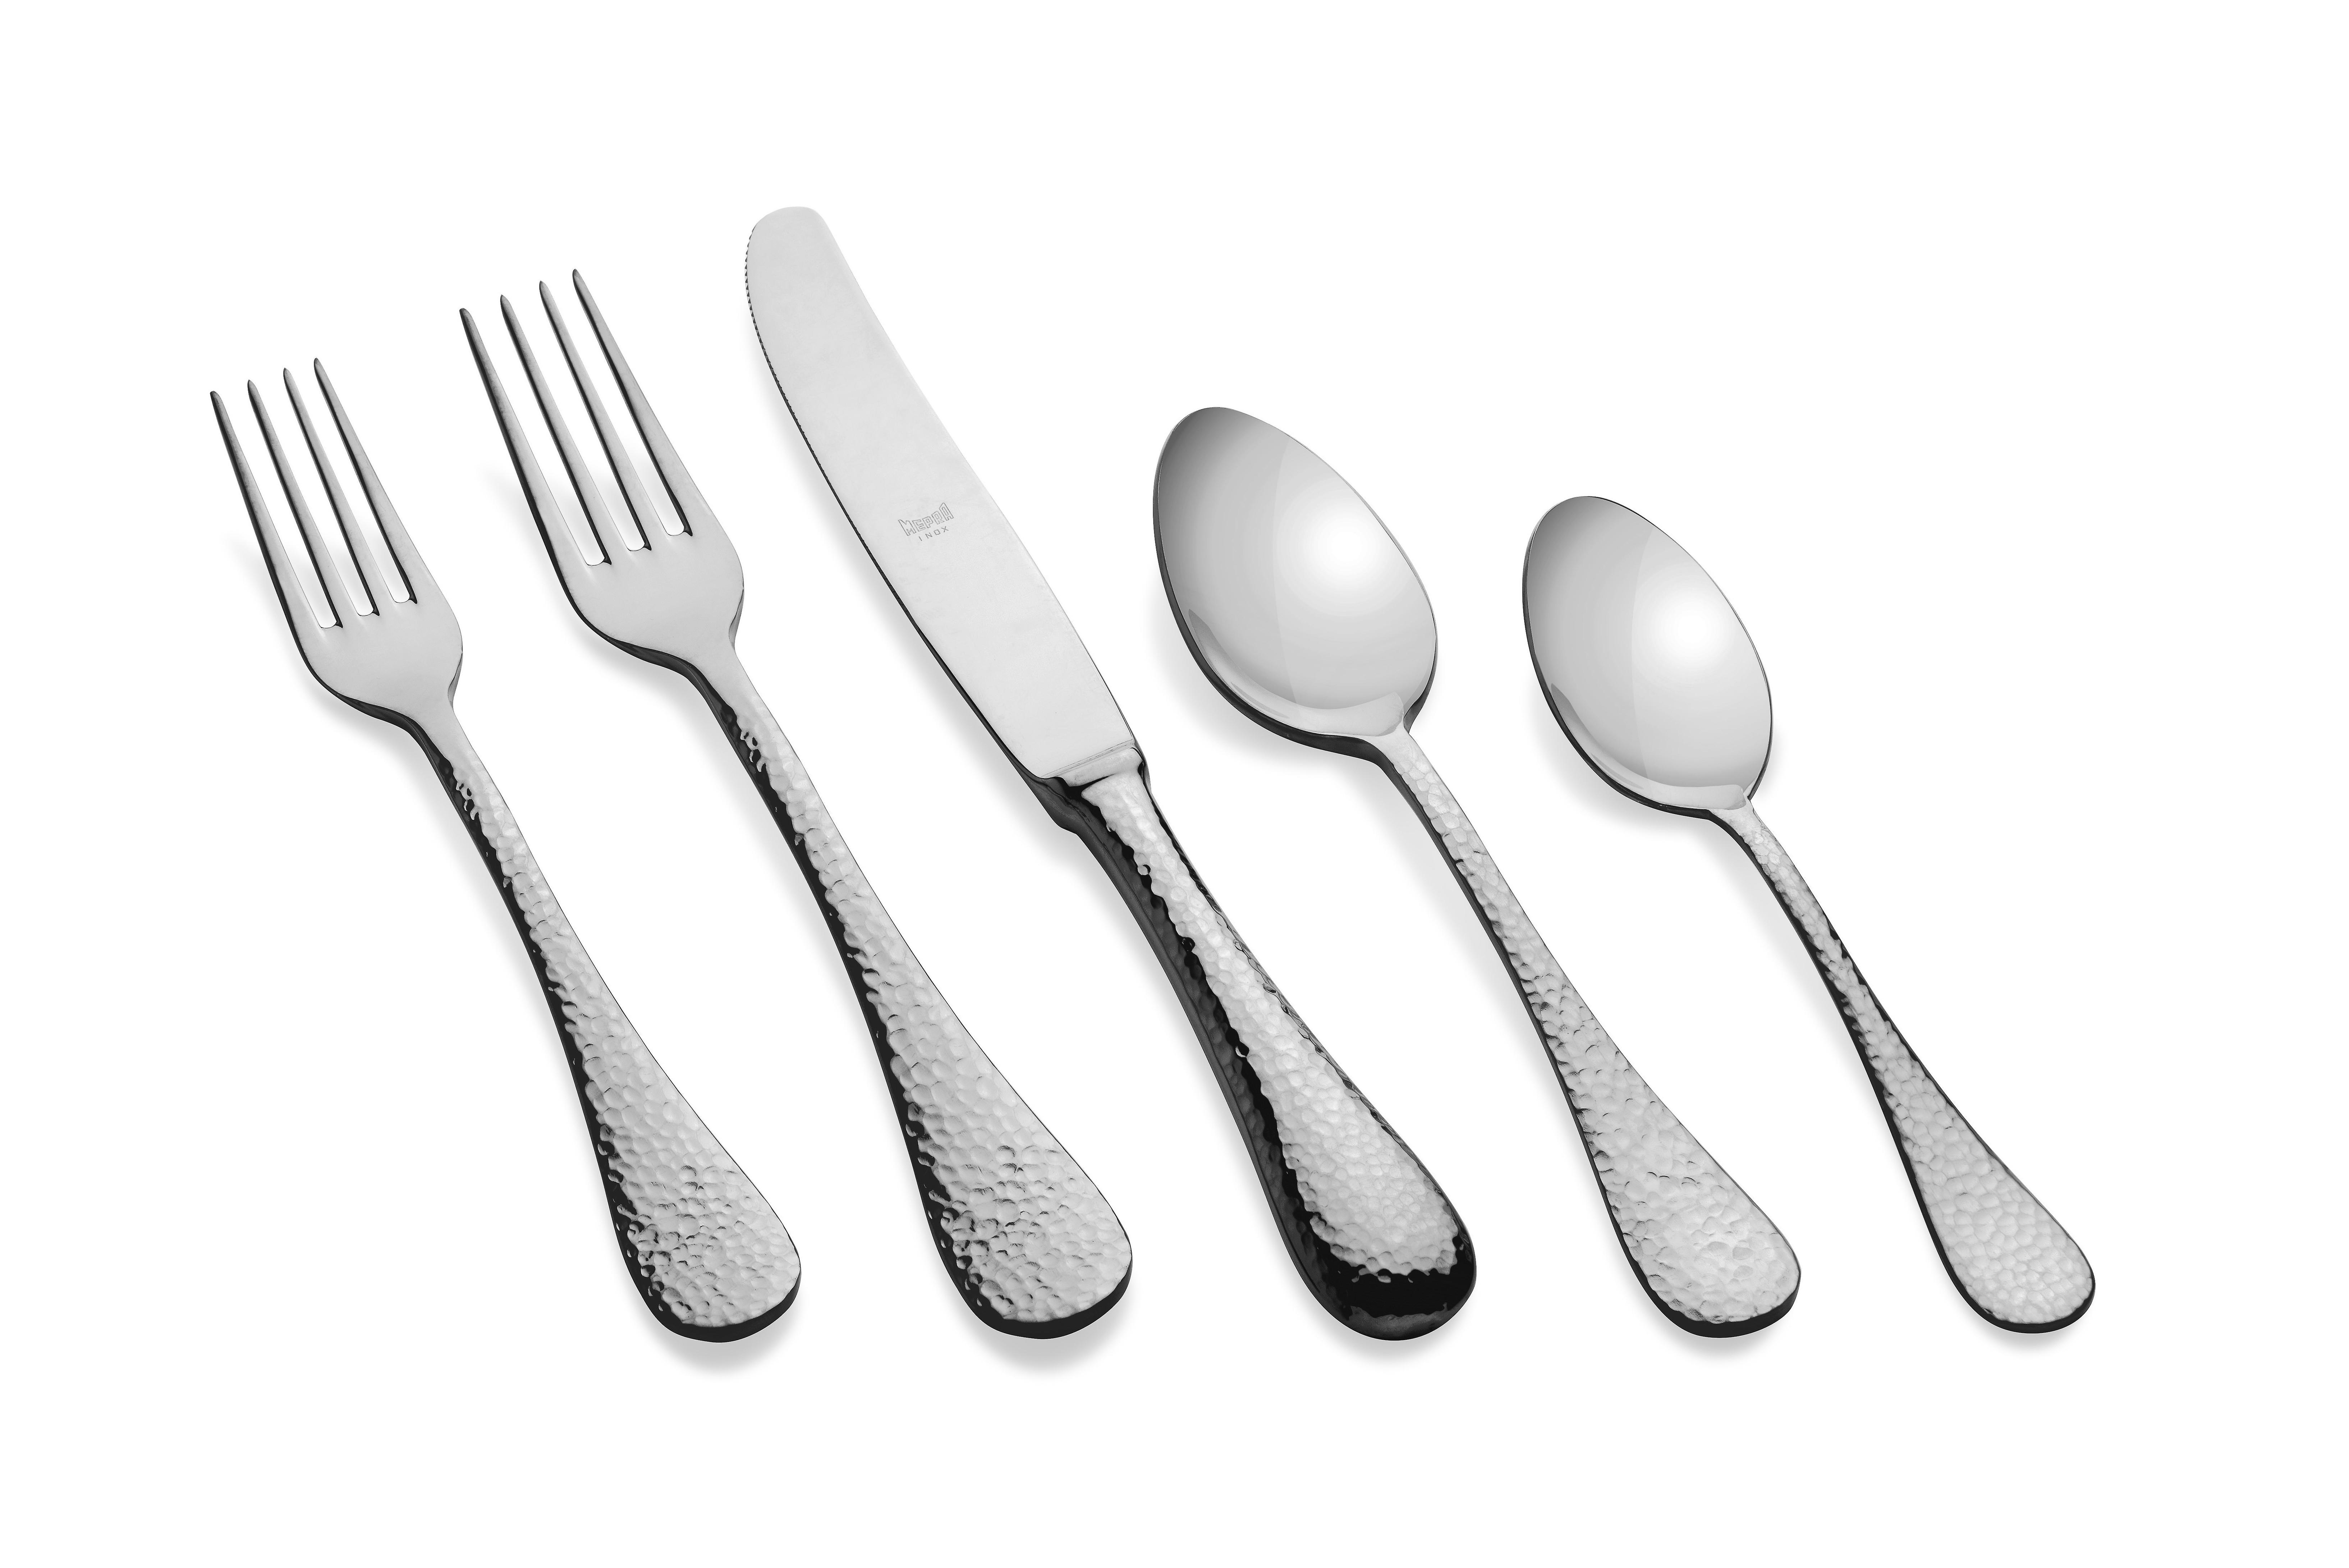 Mepra Epoque 5 pcs flatware set